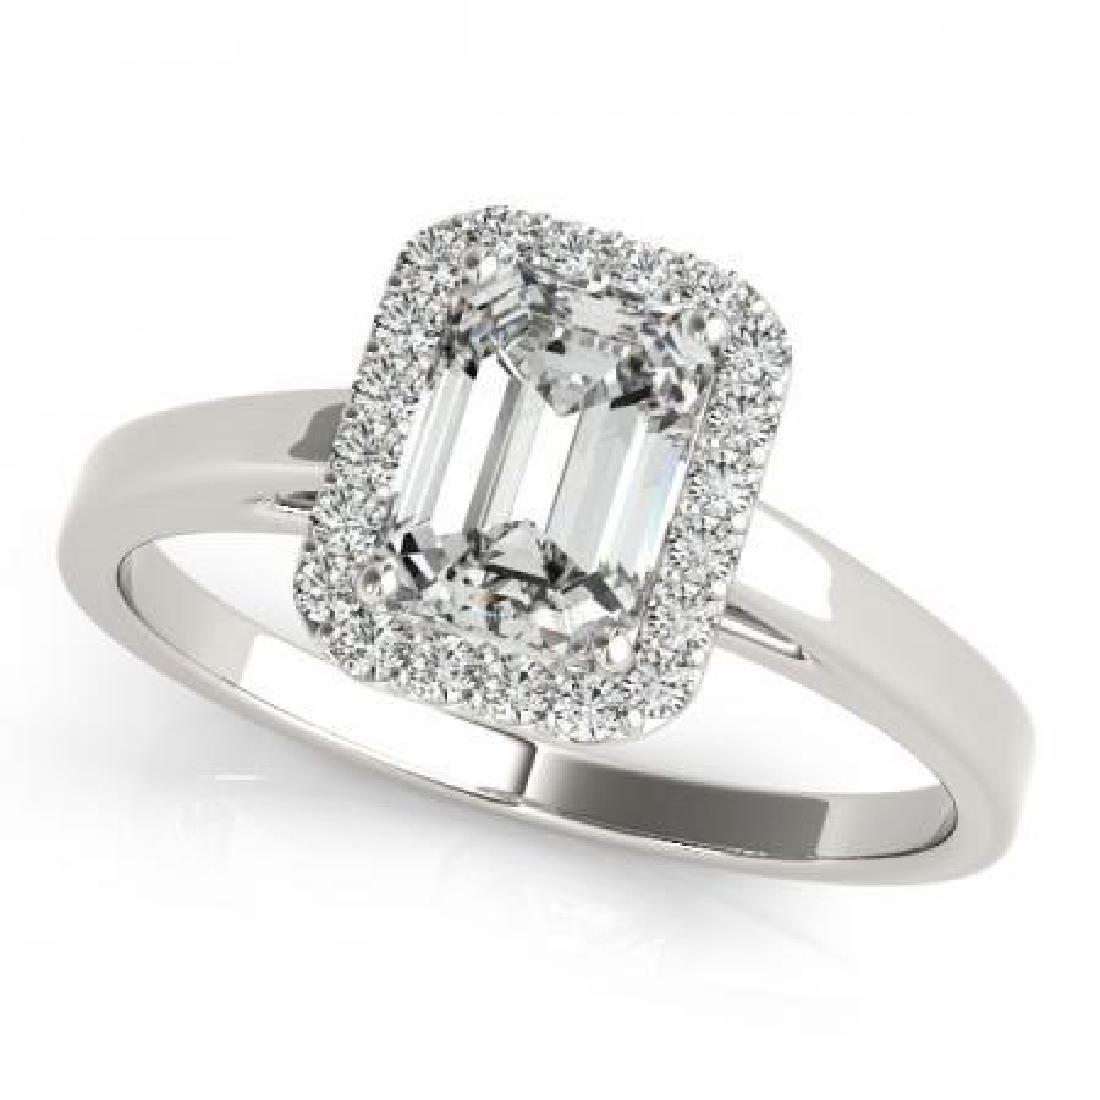 CERTIFIED 18KT WHITE GOLD 1.10 CT G-H/VS-SI1 DIAMOND HA